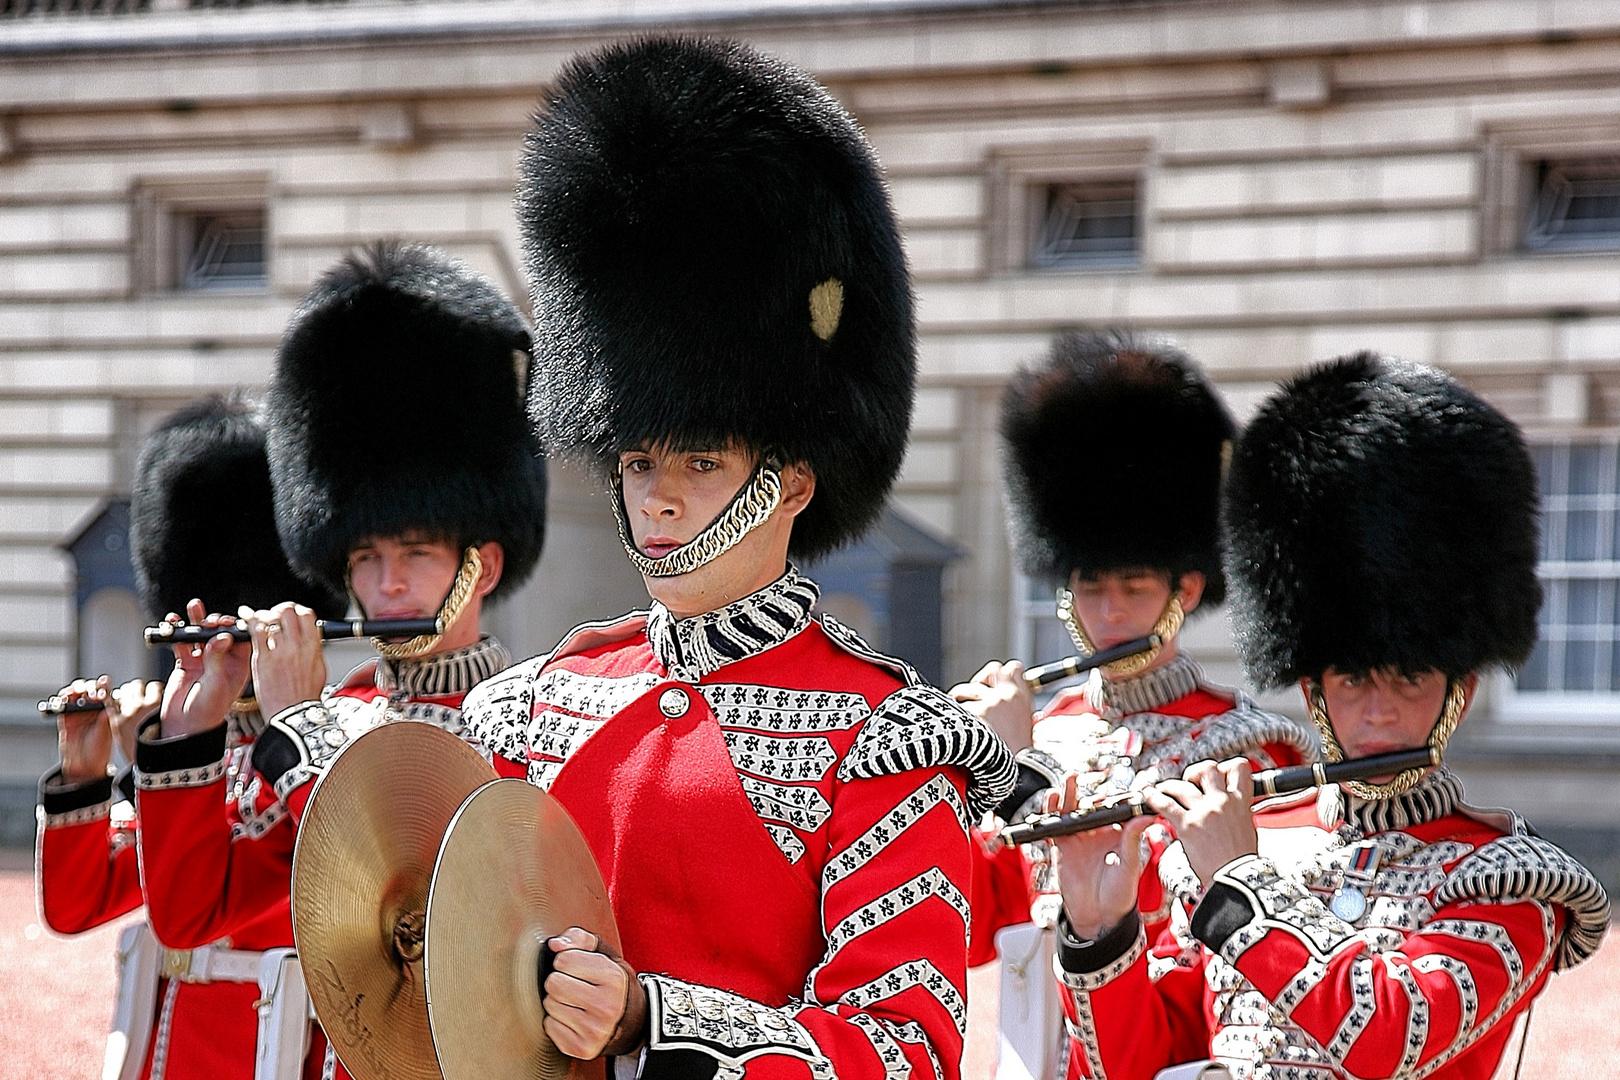 Blickkontakt @ Changing The Guard / Buckingham Palace / London